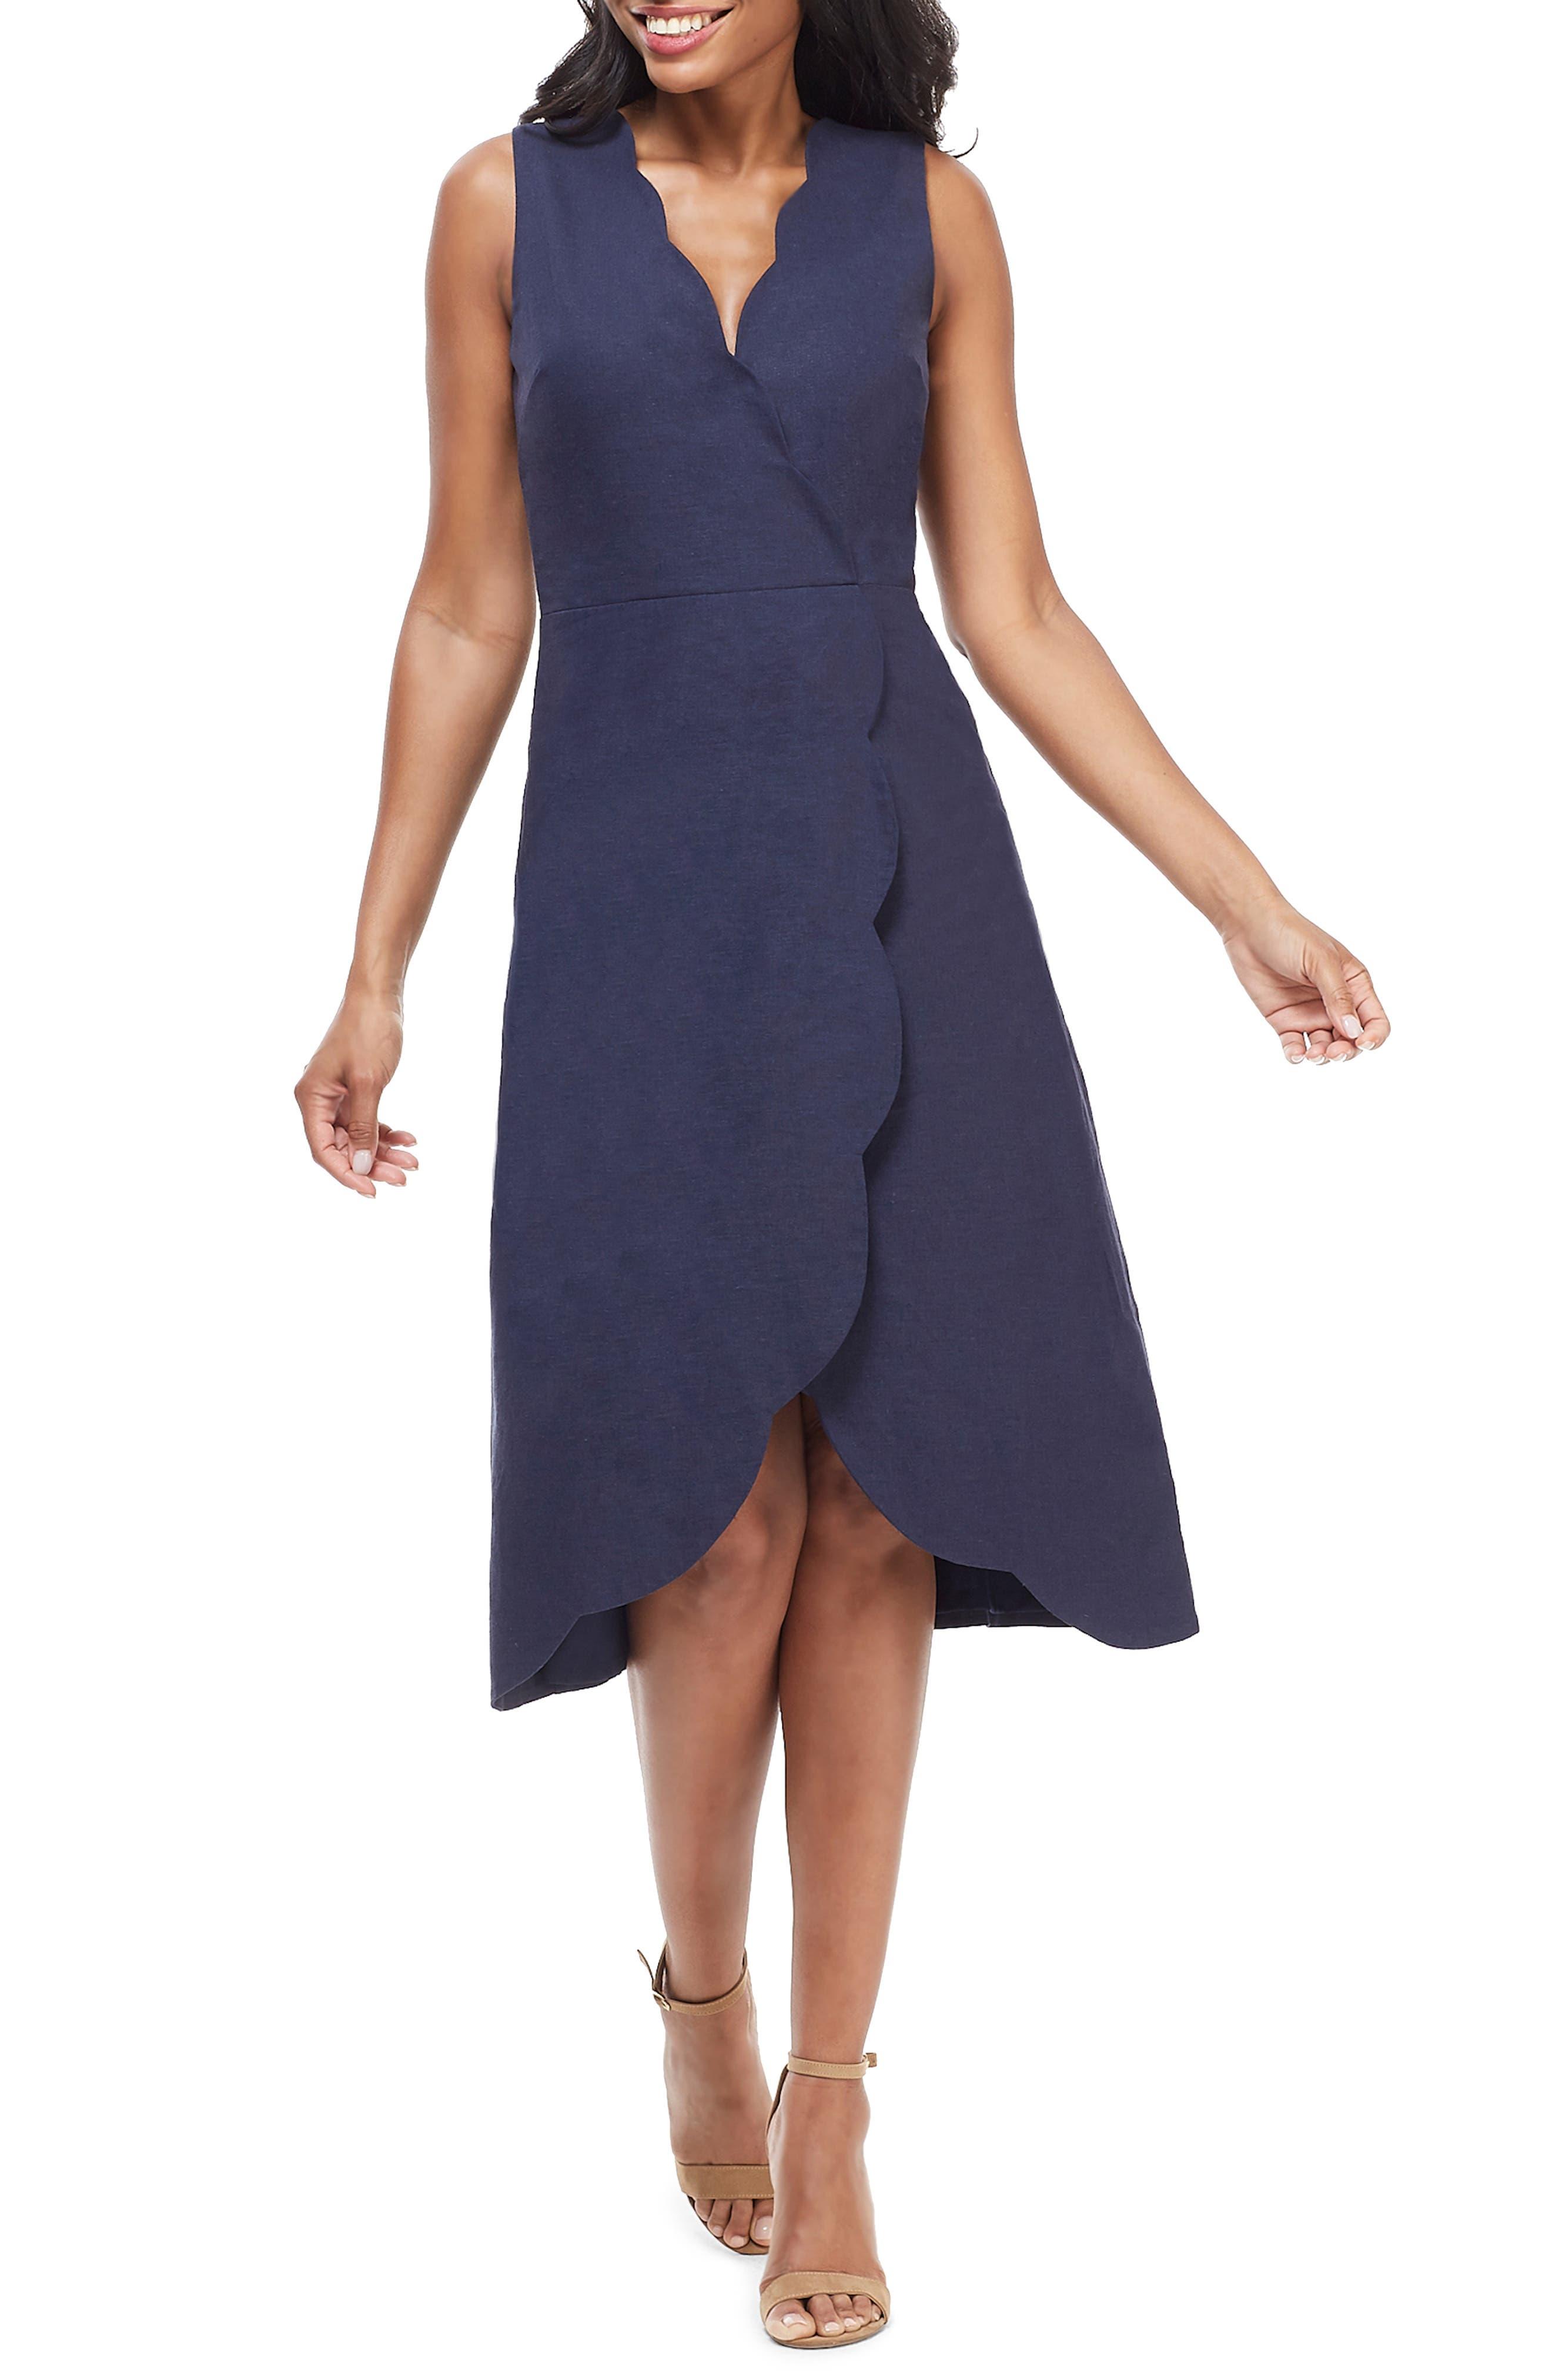 Maggy London Rochelle Linen Blend Midi Dress, Blue